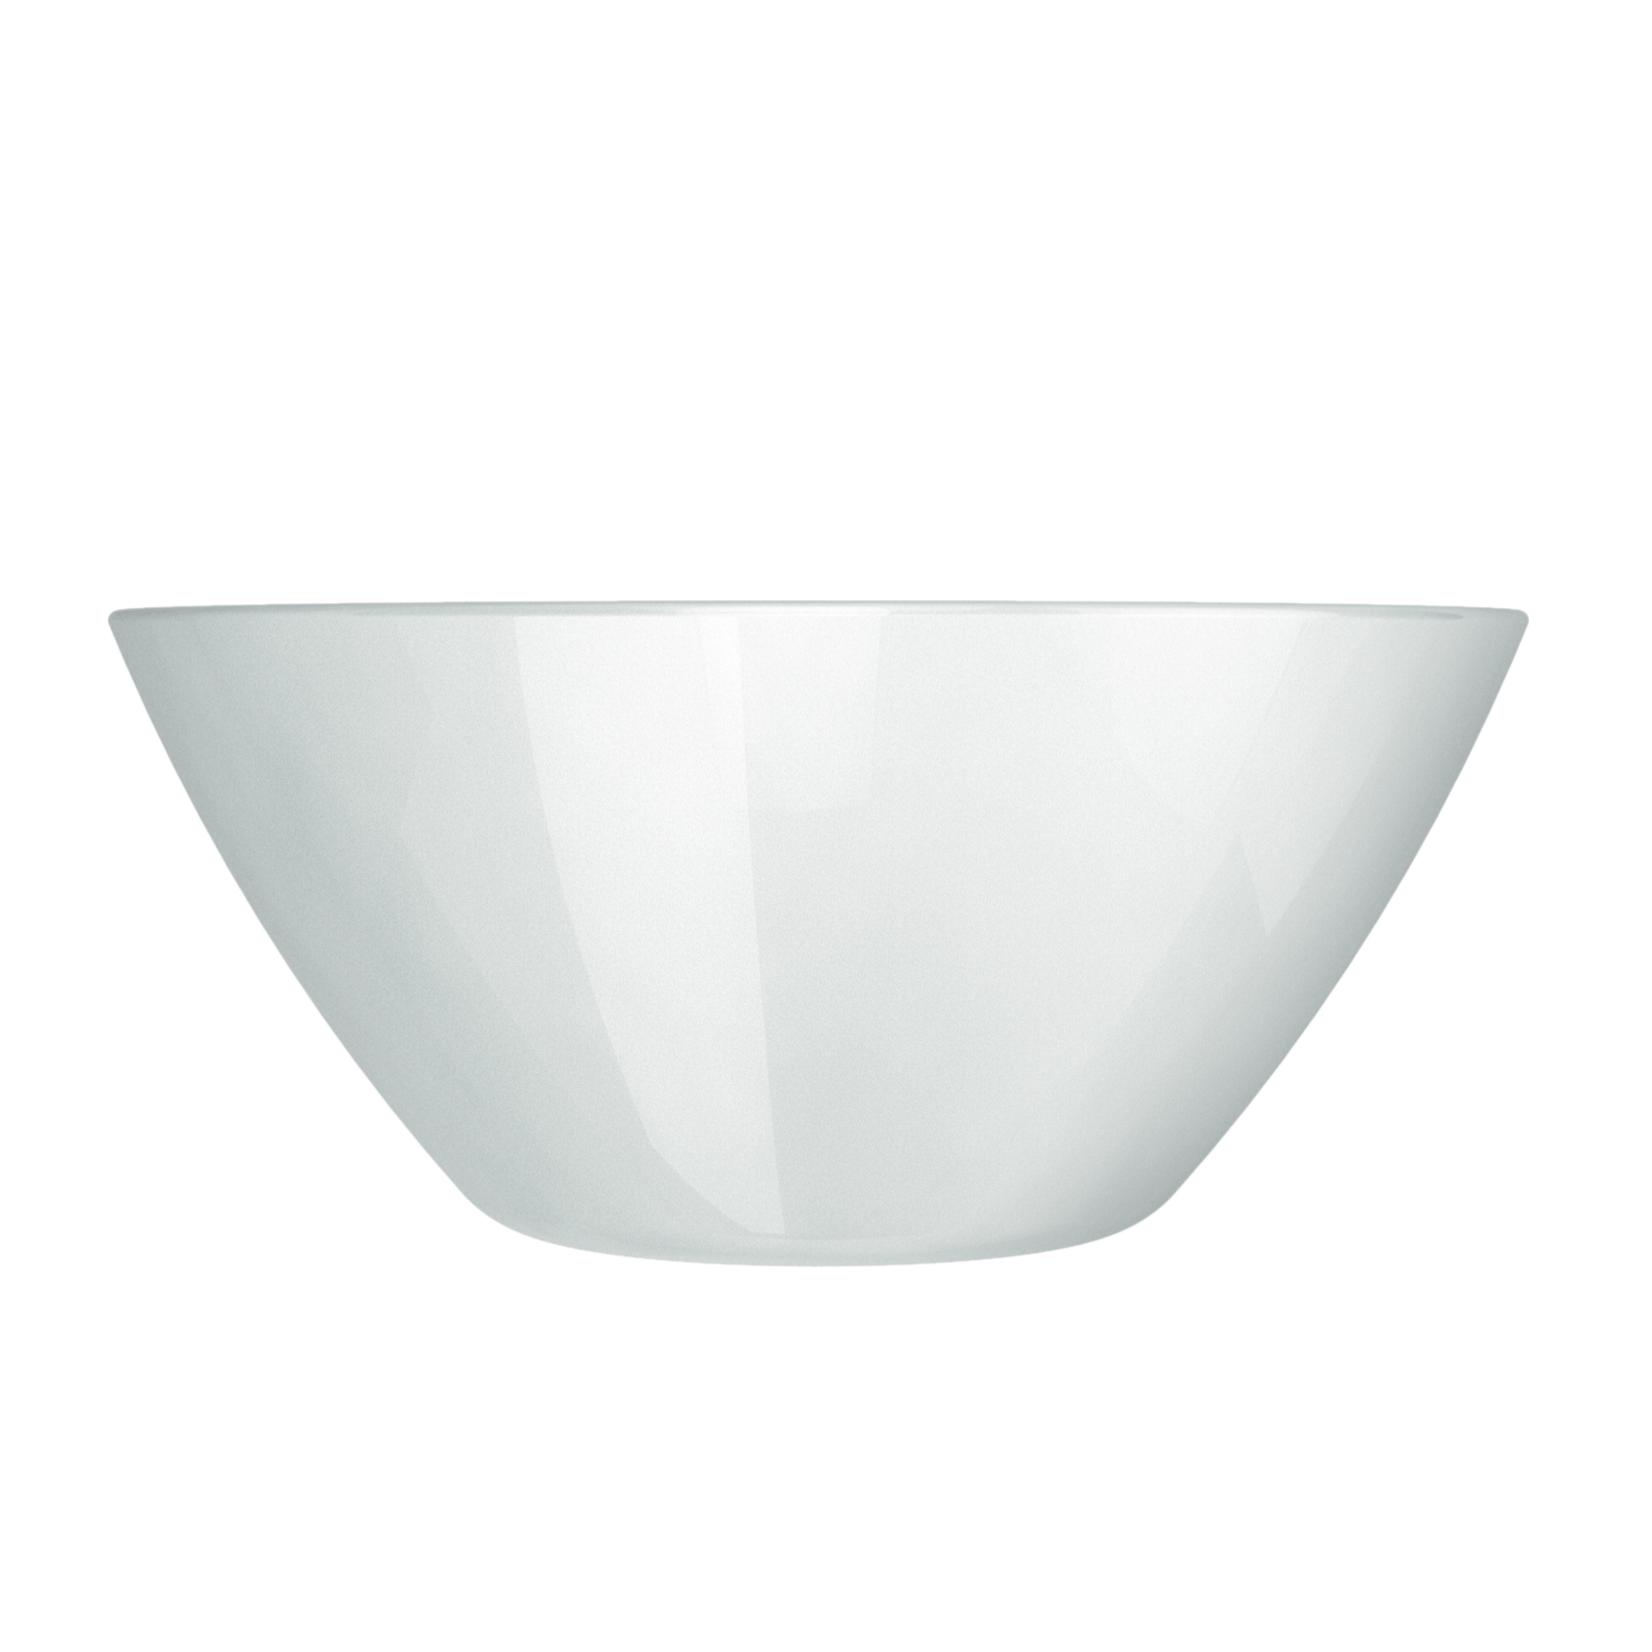 Saladeira Funda de Vidro Blanc 840ml Branco - Nadir